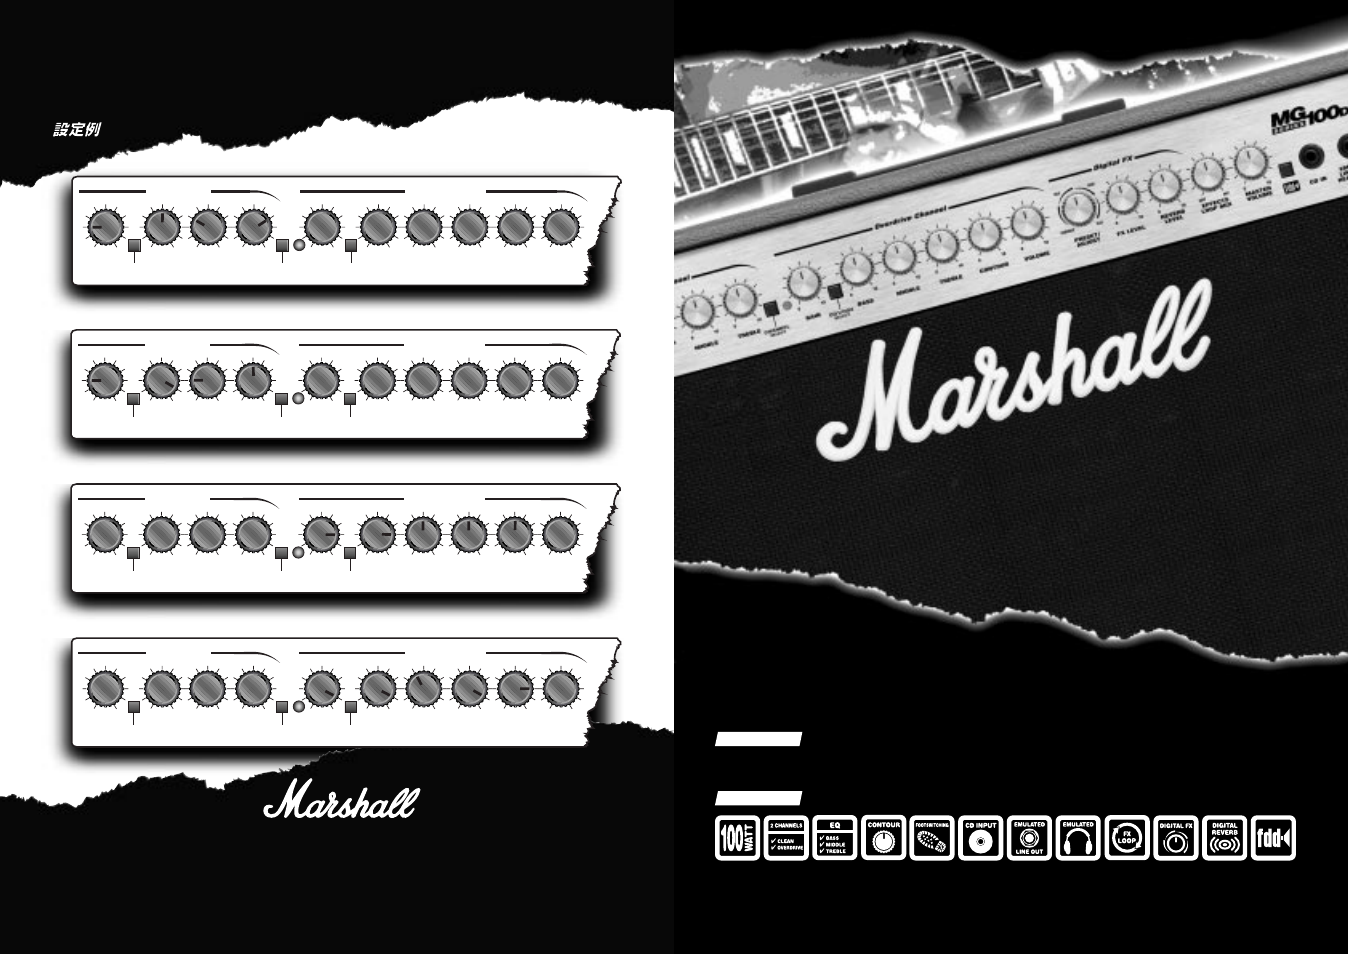 marshall amplification mg100dfx user manual 6 pages also for rh manualsdir com marshall mg100fx manual marshall mg100fx manual